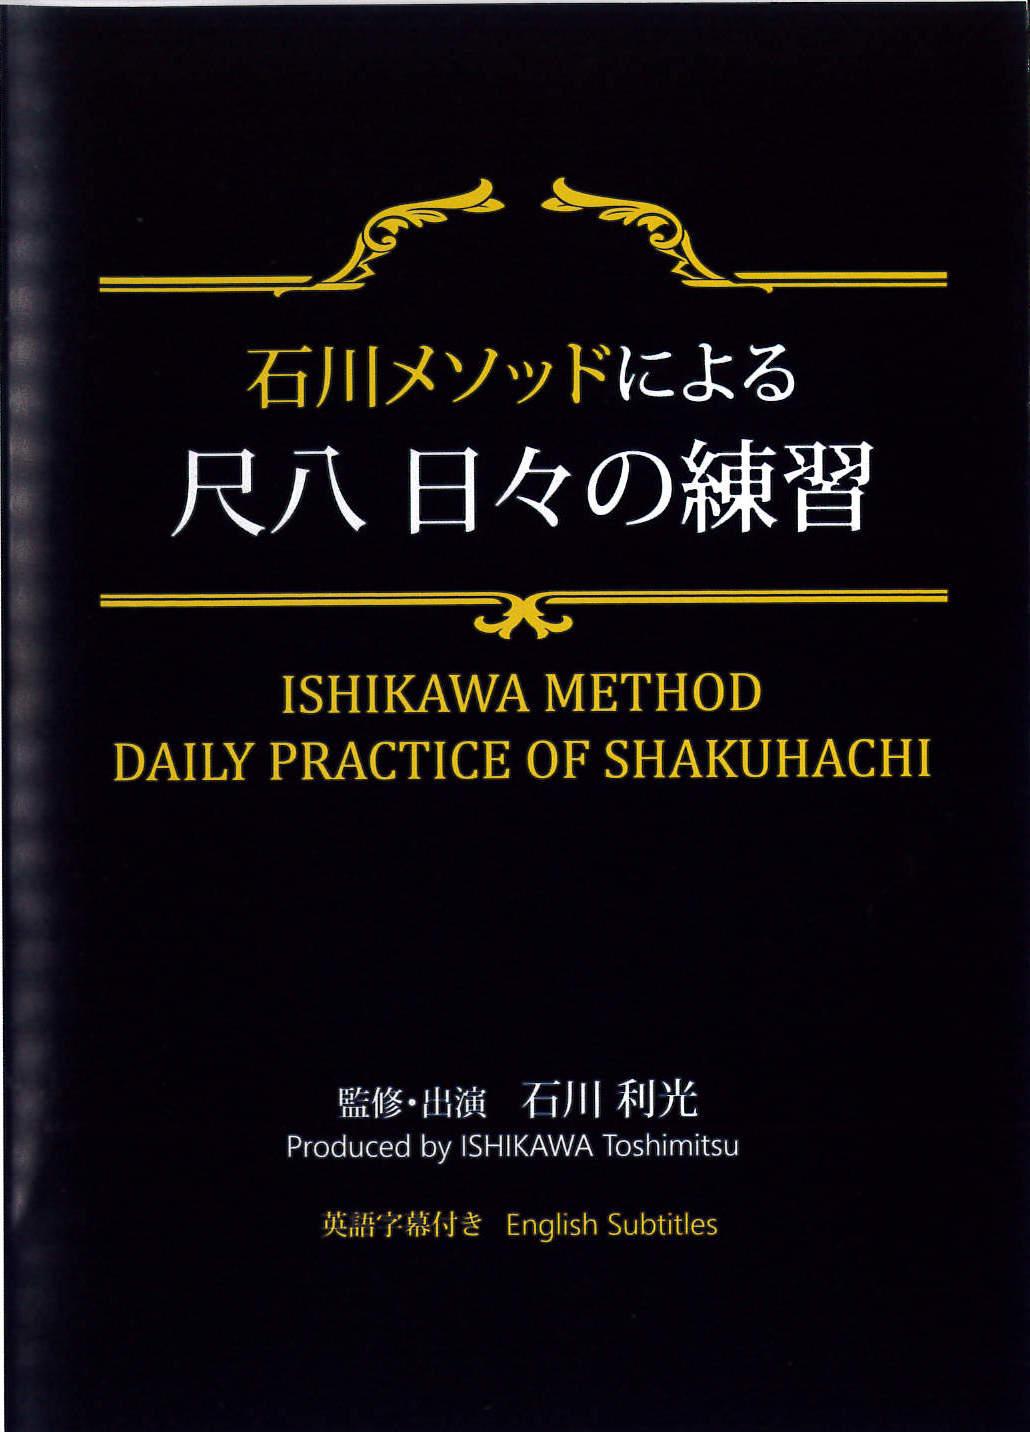 DVD ISHIKAWA METHOD DAILY PRACTICE OF SHAKUHACHI[4180]